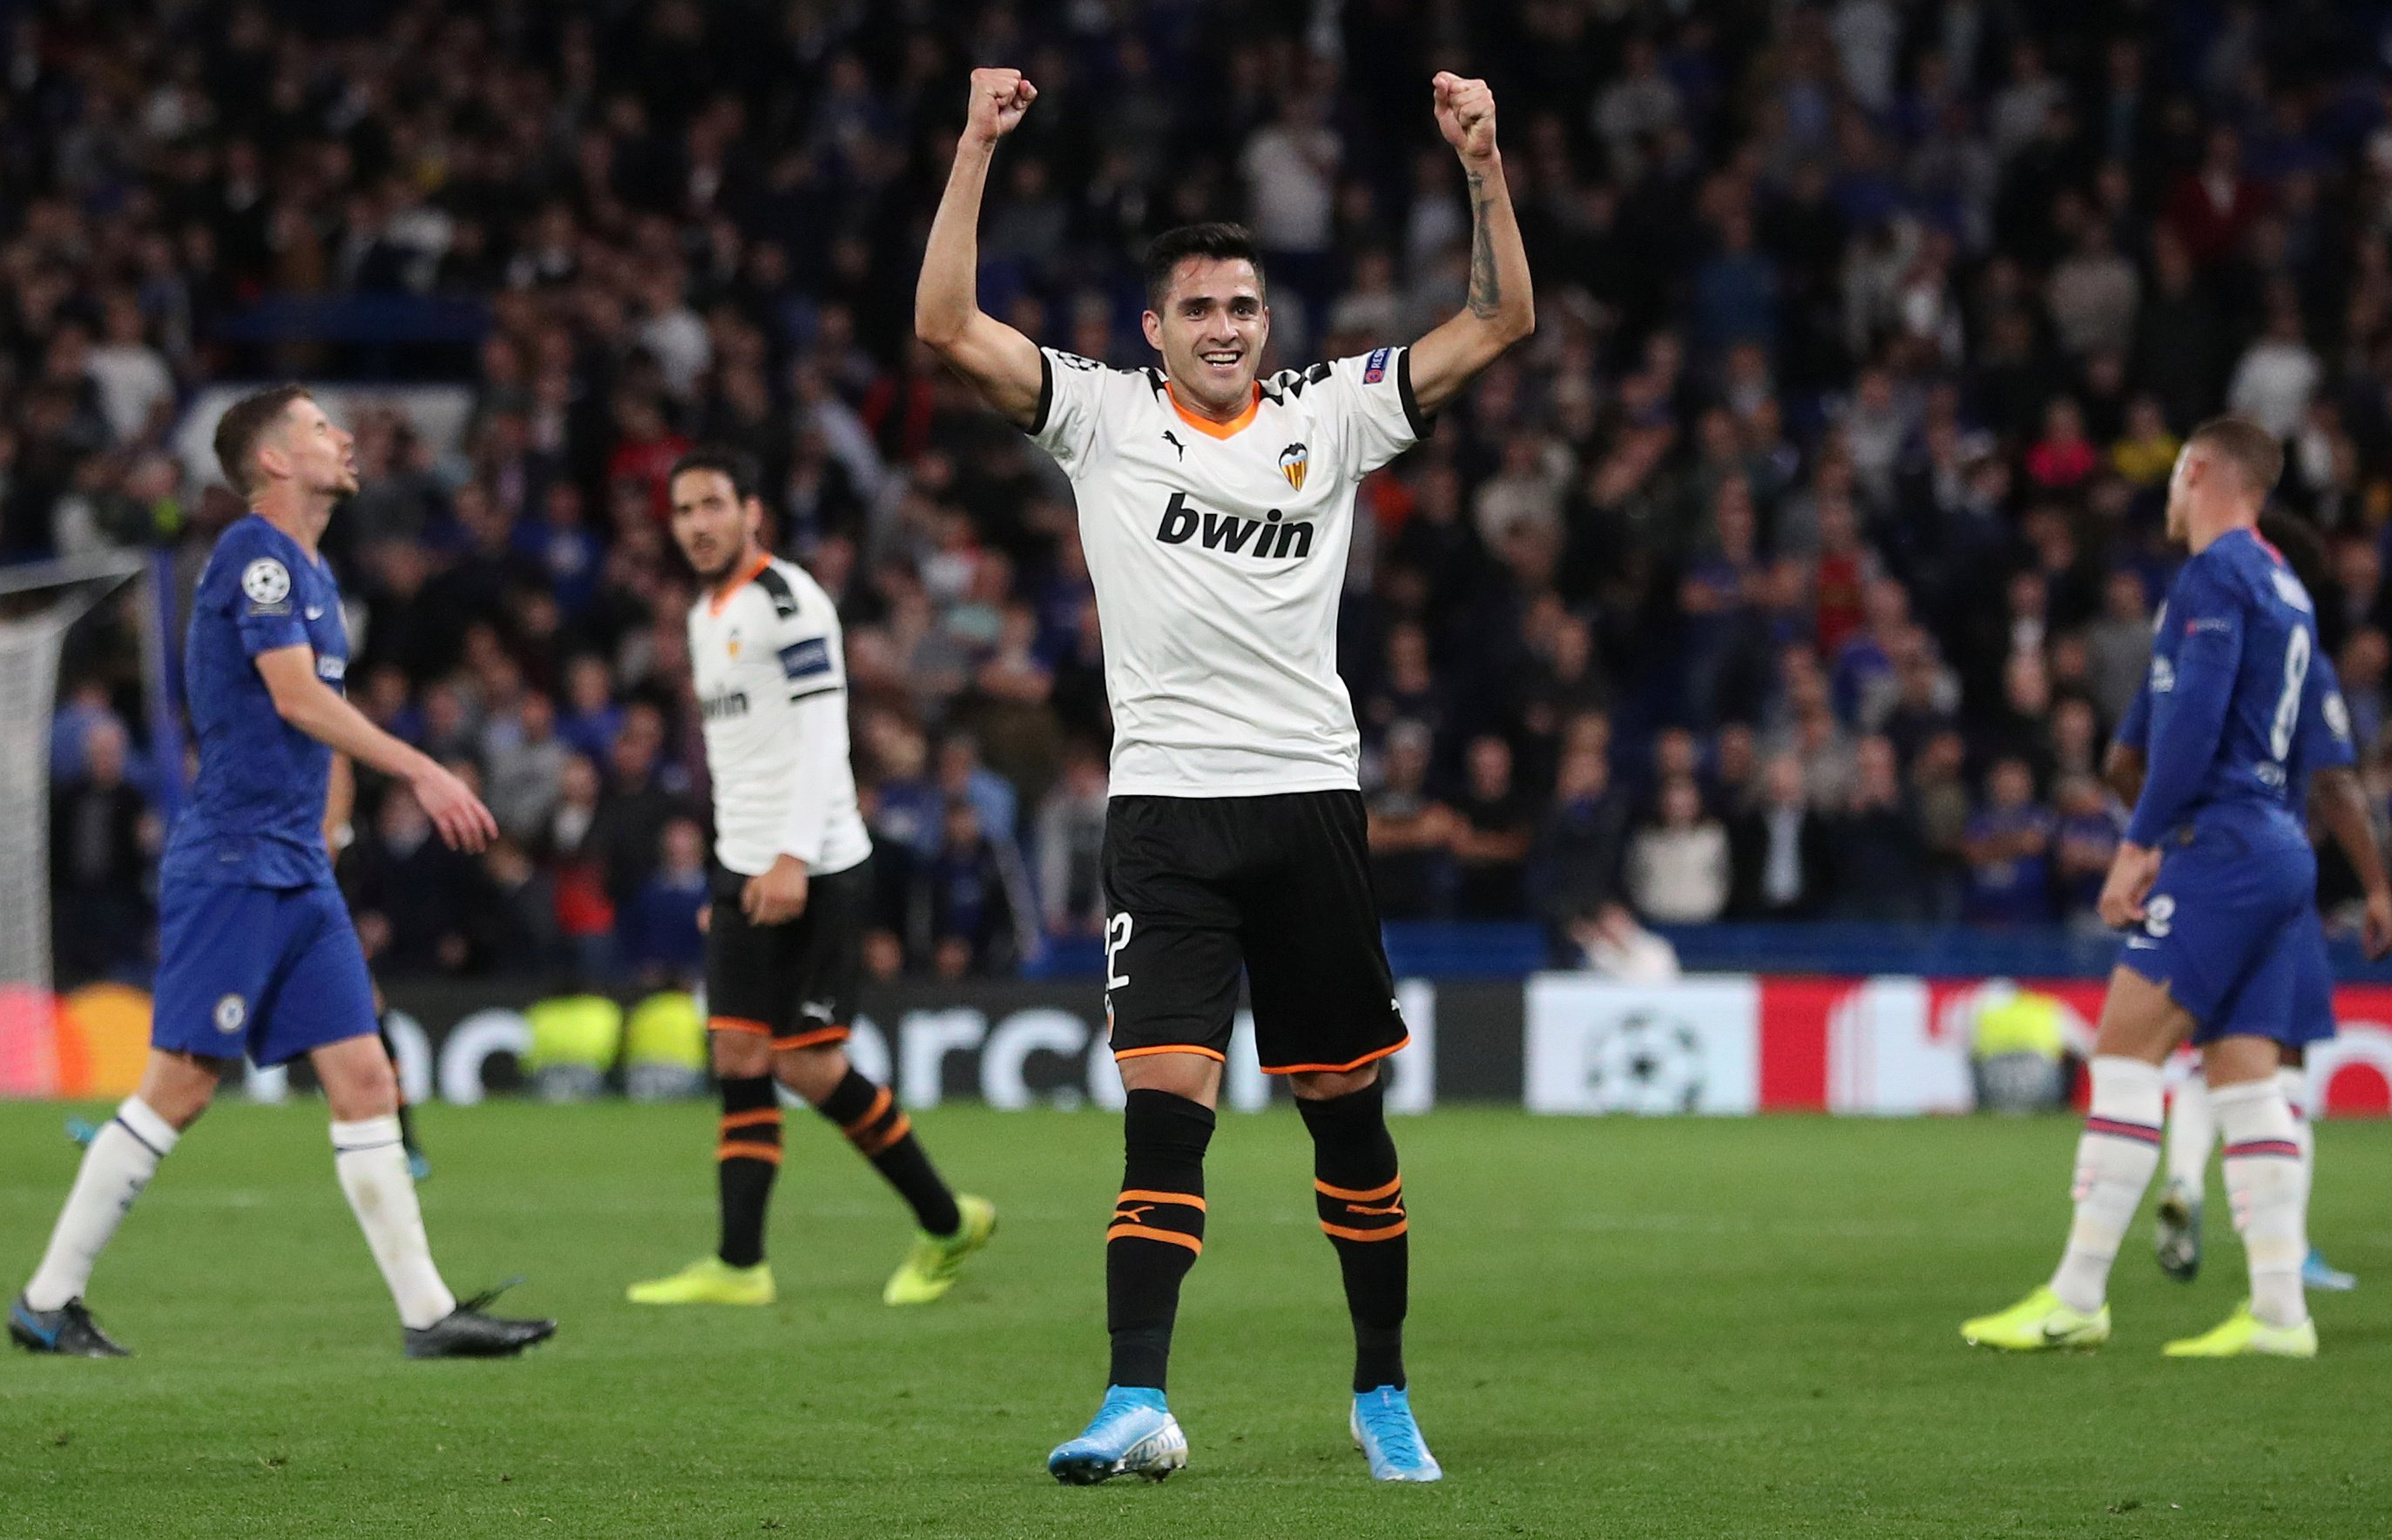 La Liga gambling sponsorship ban